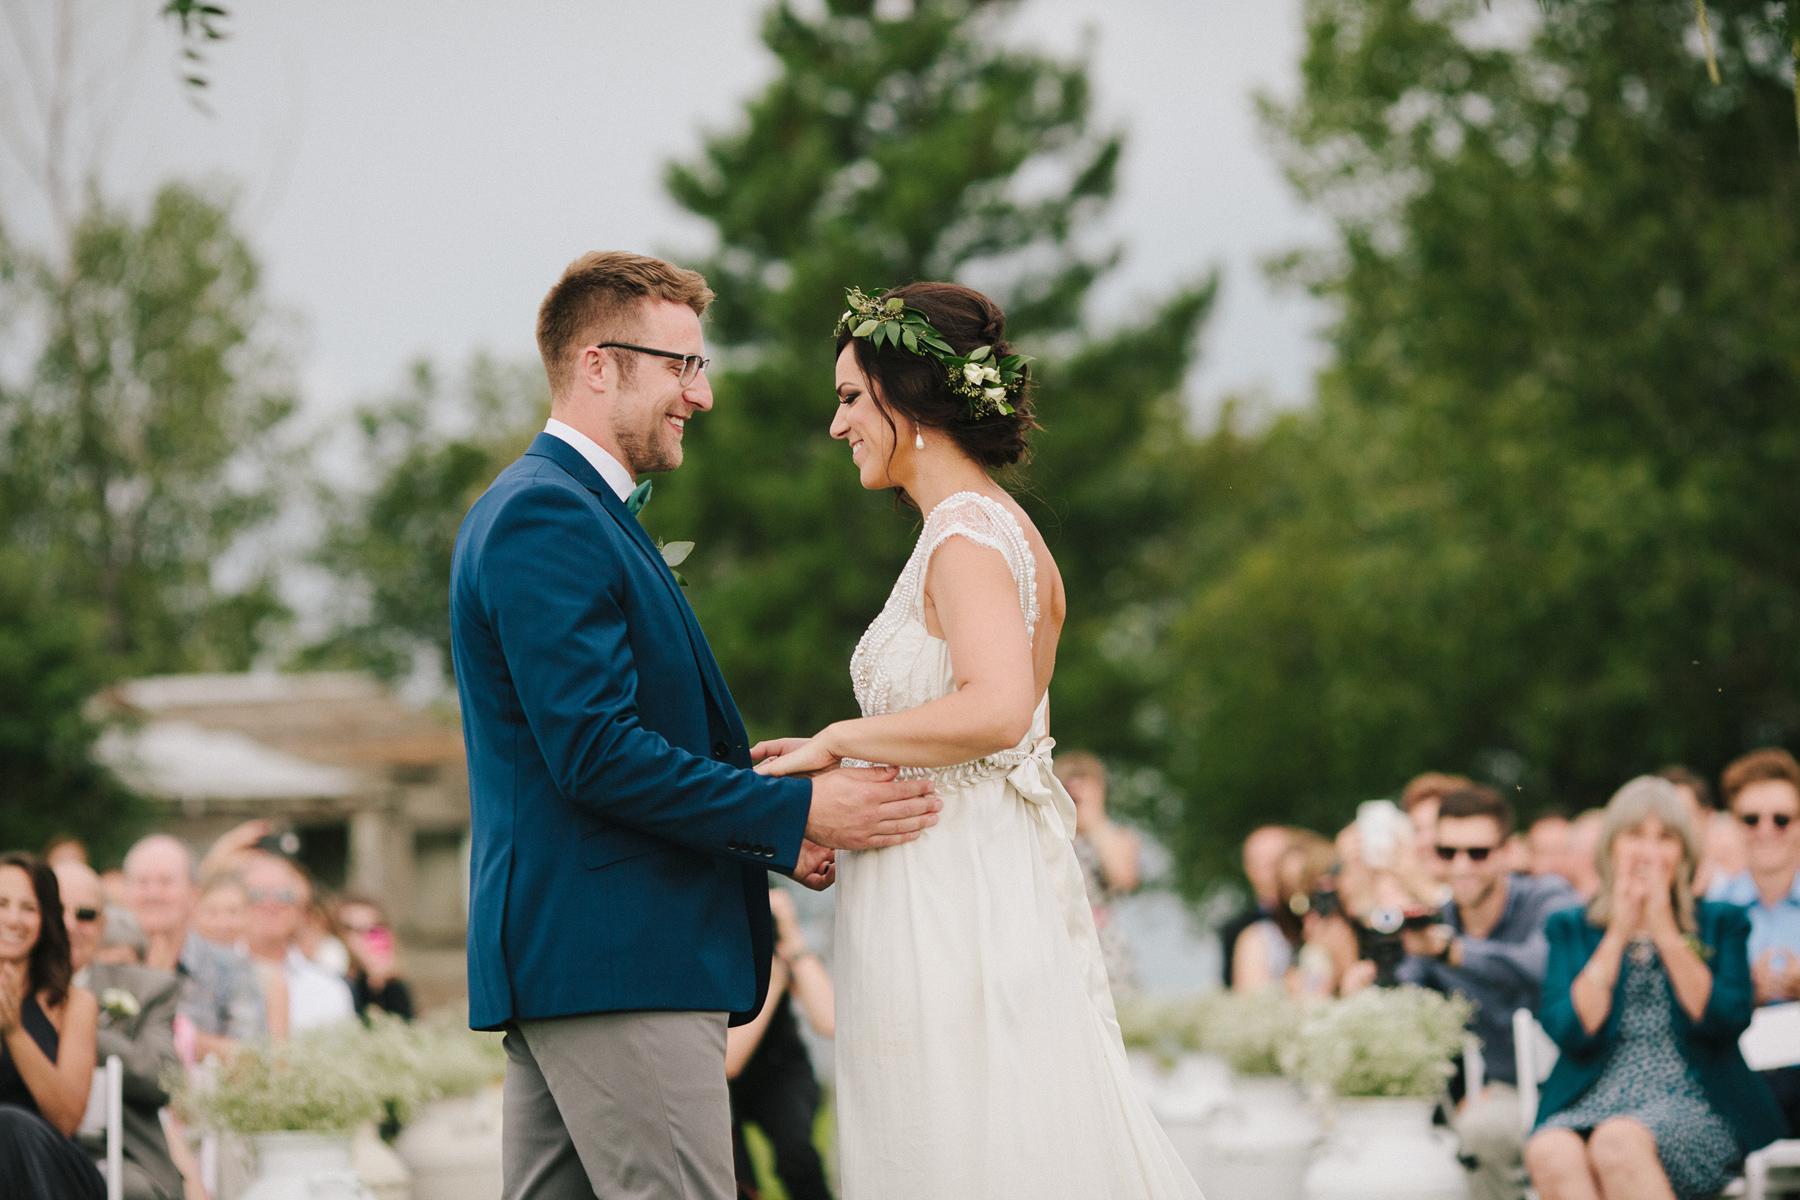 alberta-farm-wedding-photographer-rp-wj-144.jpg